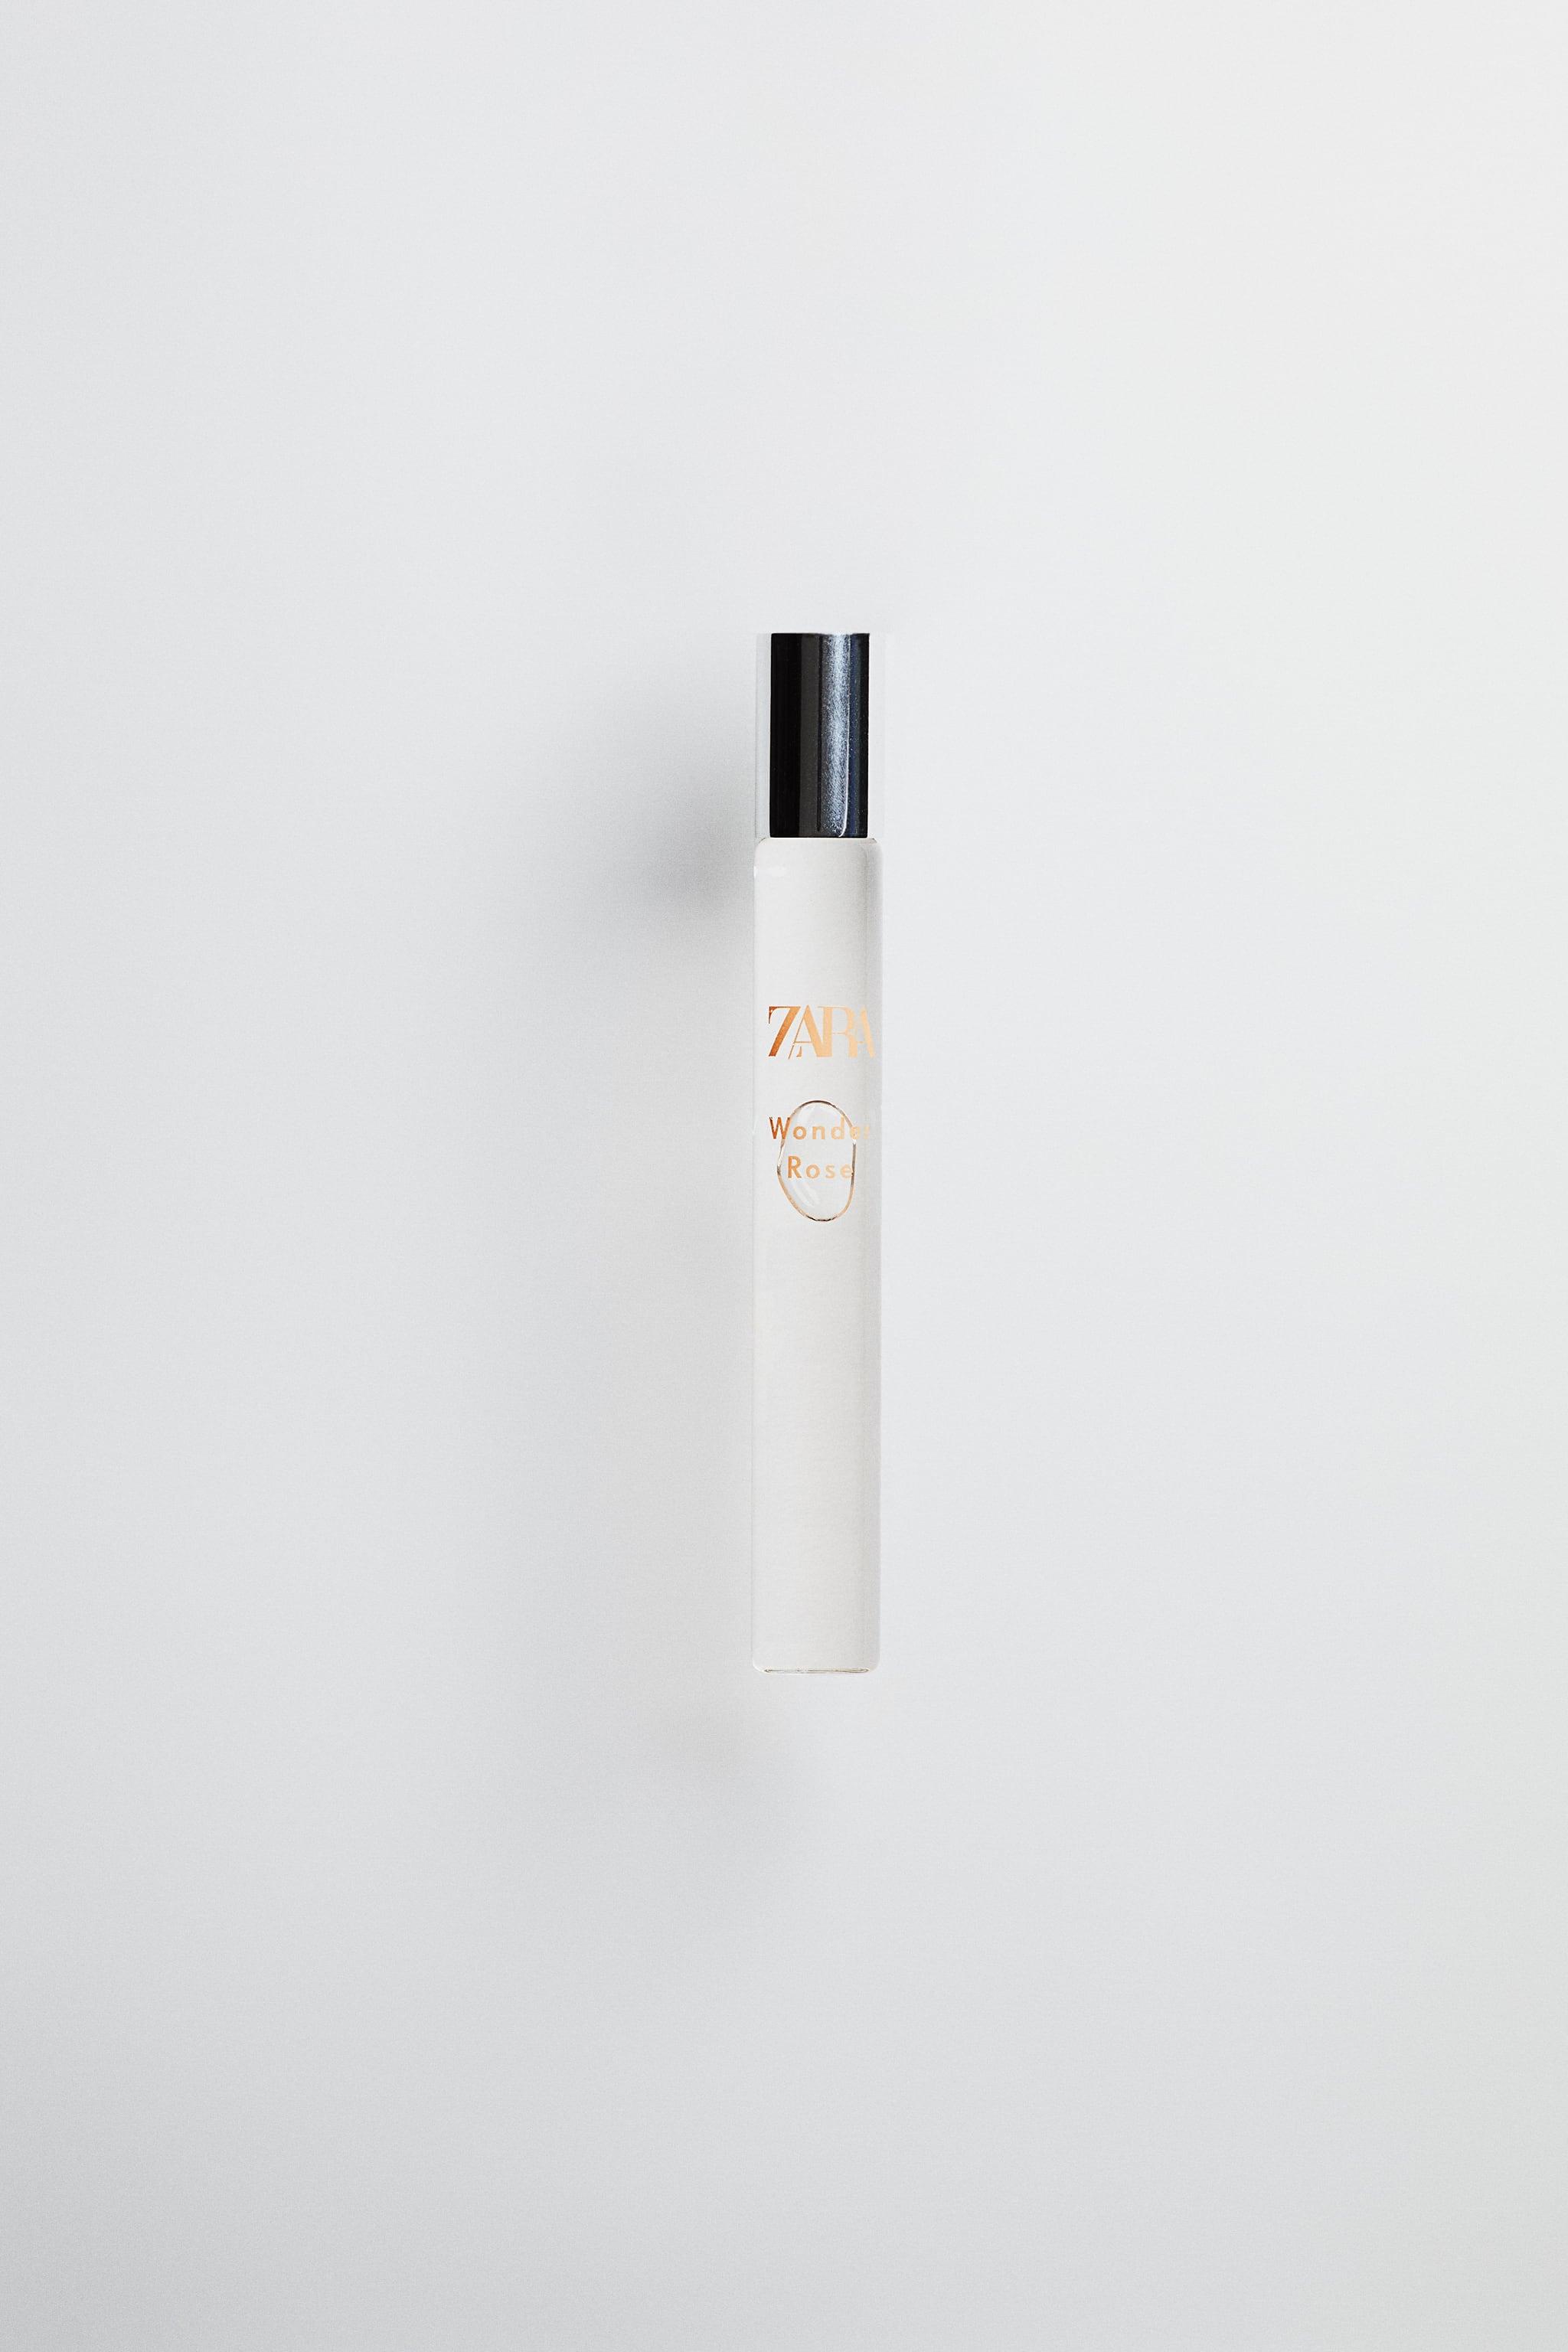 Zara WONDER ROSE SPRING 10 ML (0.34 FL. OZ)